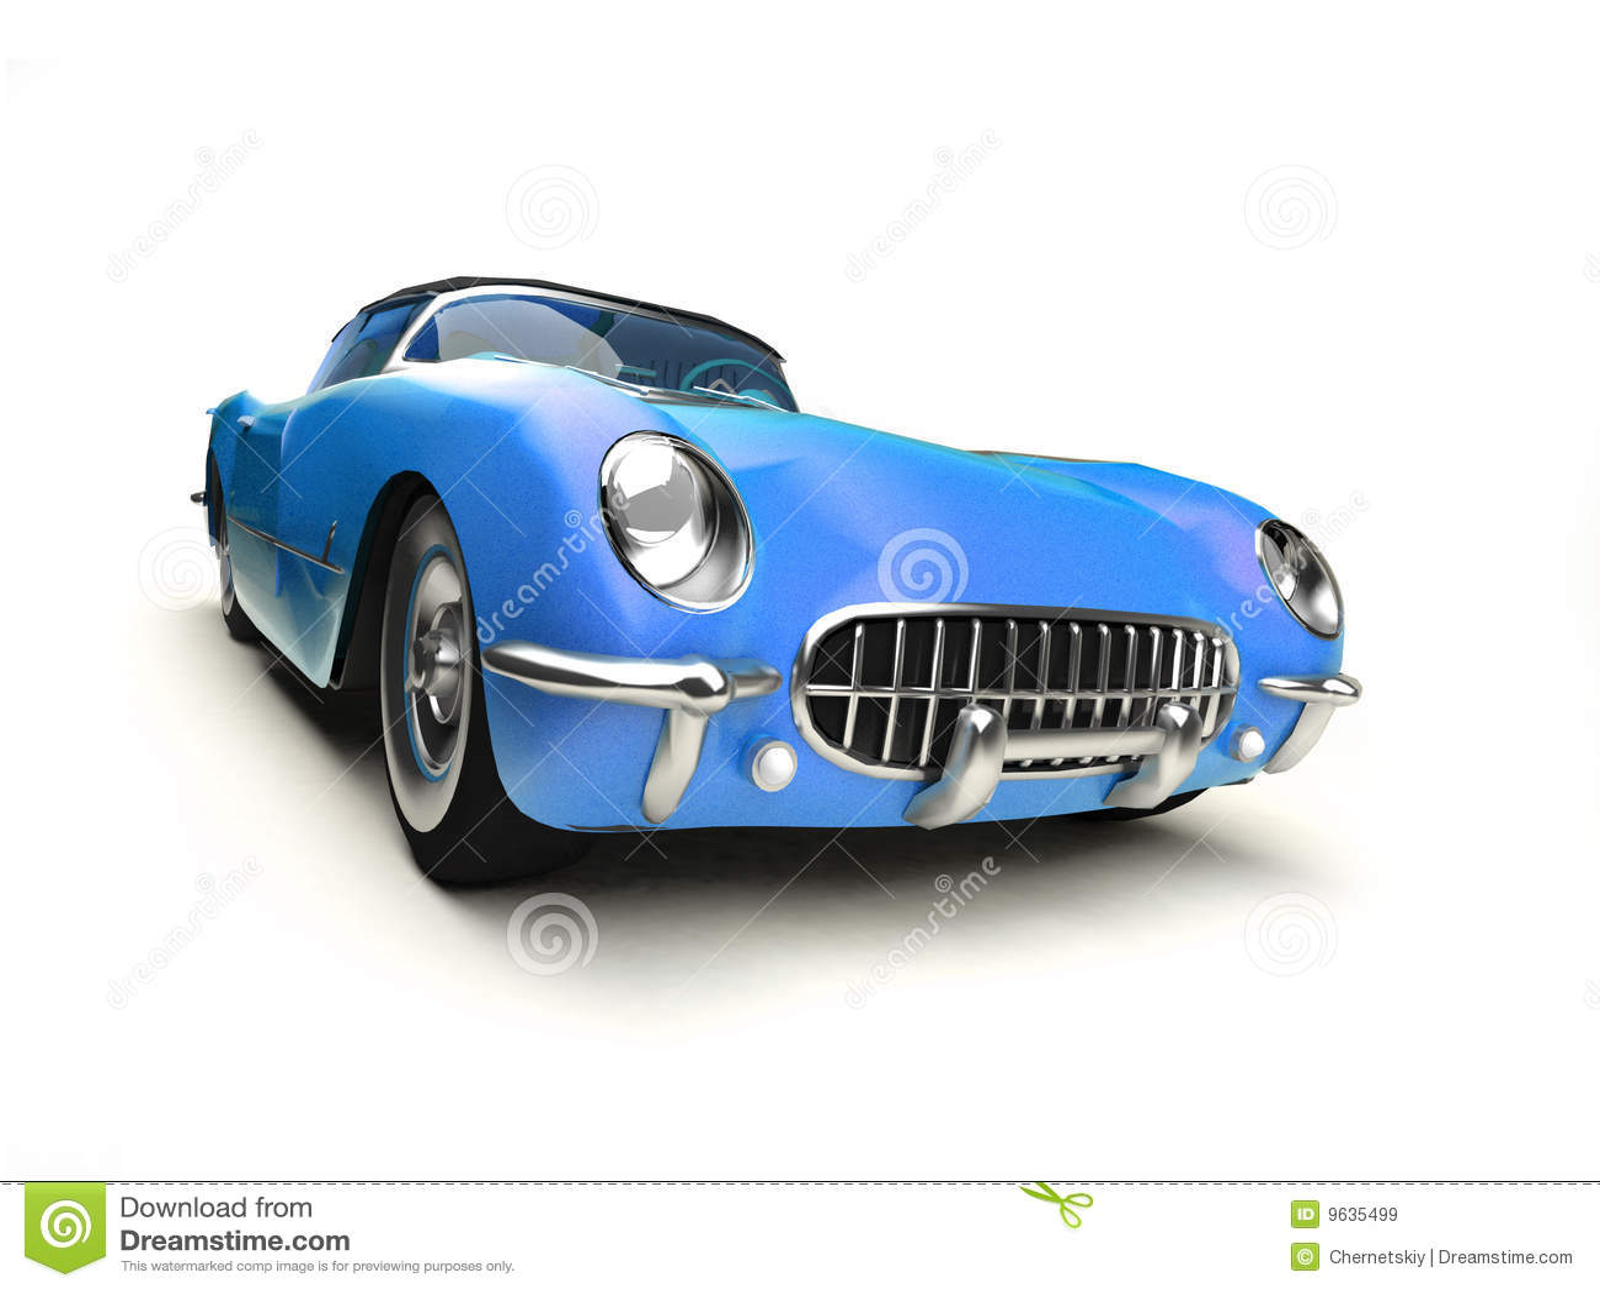 Old blue sports car stock illustration. Illustration of isolated ...